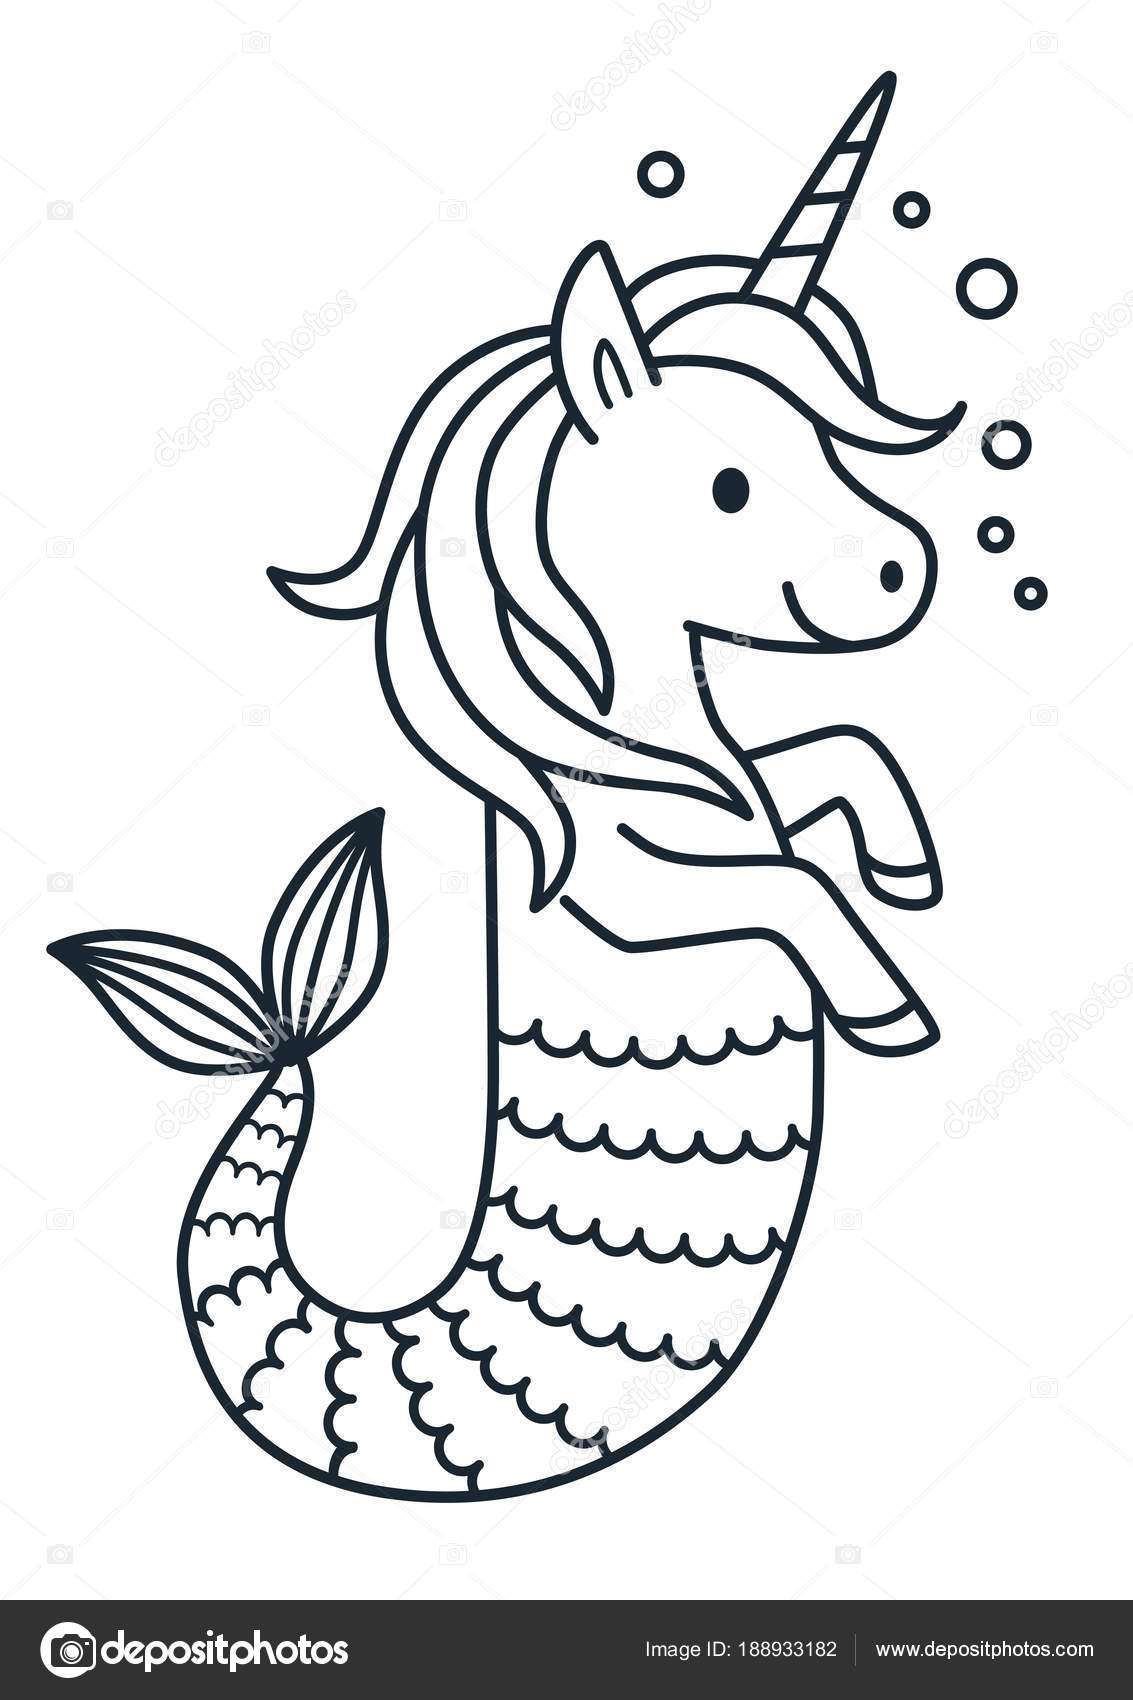 Kleurplaten Unicorn.Schattig Unicorn Zeemeermin Vector Kleurplaat Pagina Cartoon